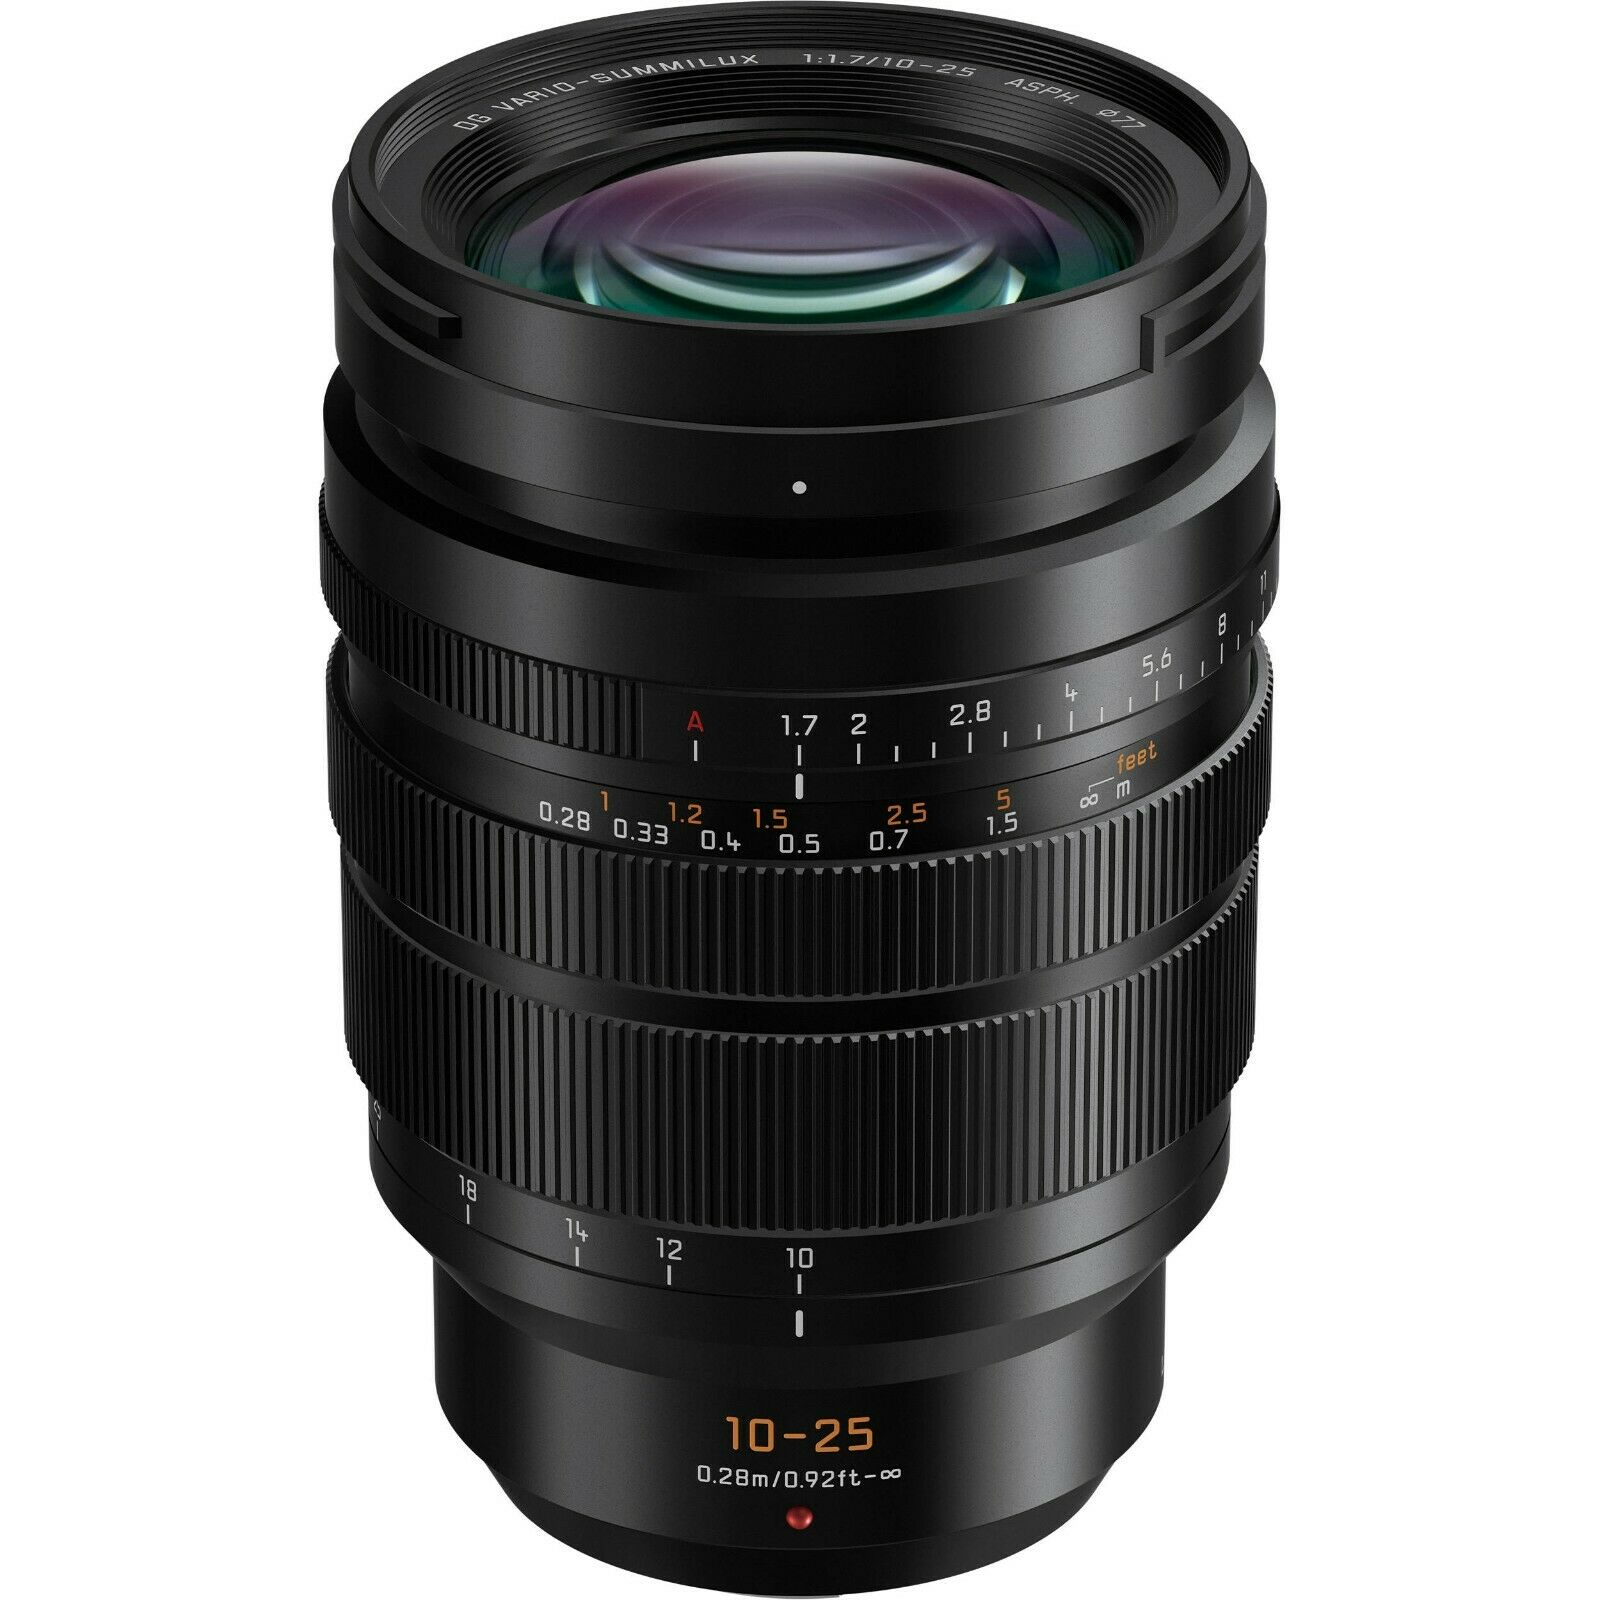 Panasonic Leica Dg Vario Summilux 10 25mm F 1 7 Asph Zoom Camera Lens Micro Four Thirds For Sale Online Ebay